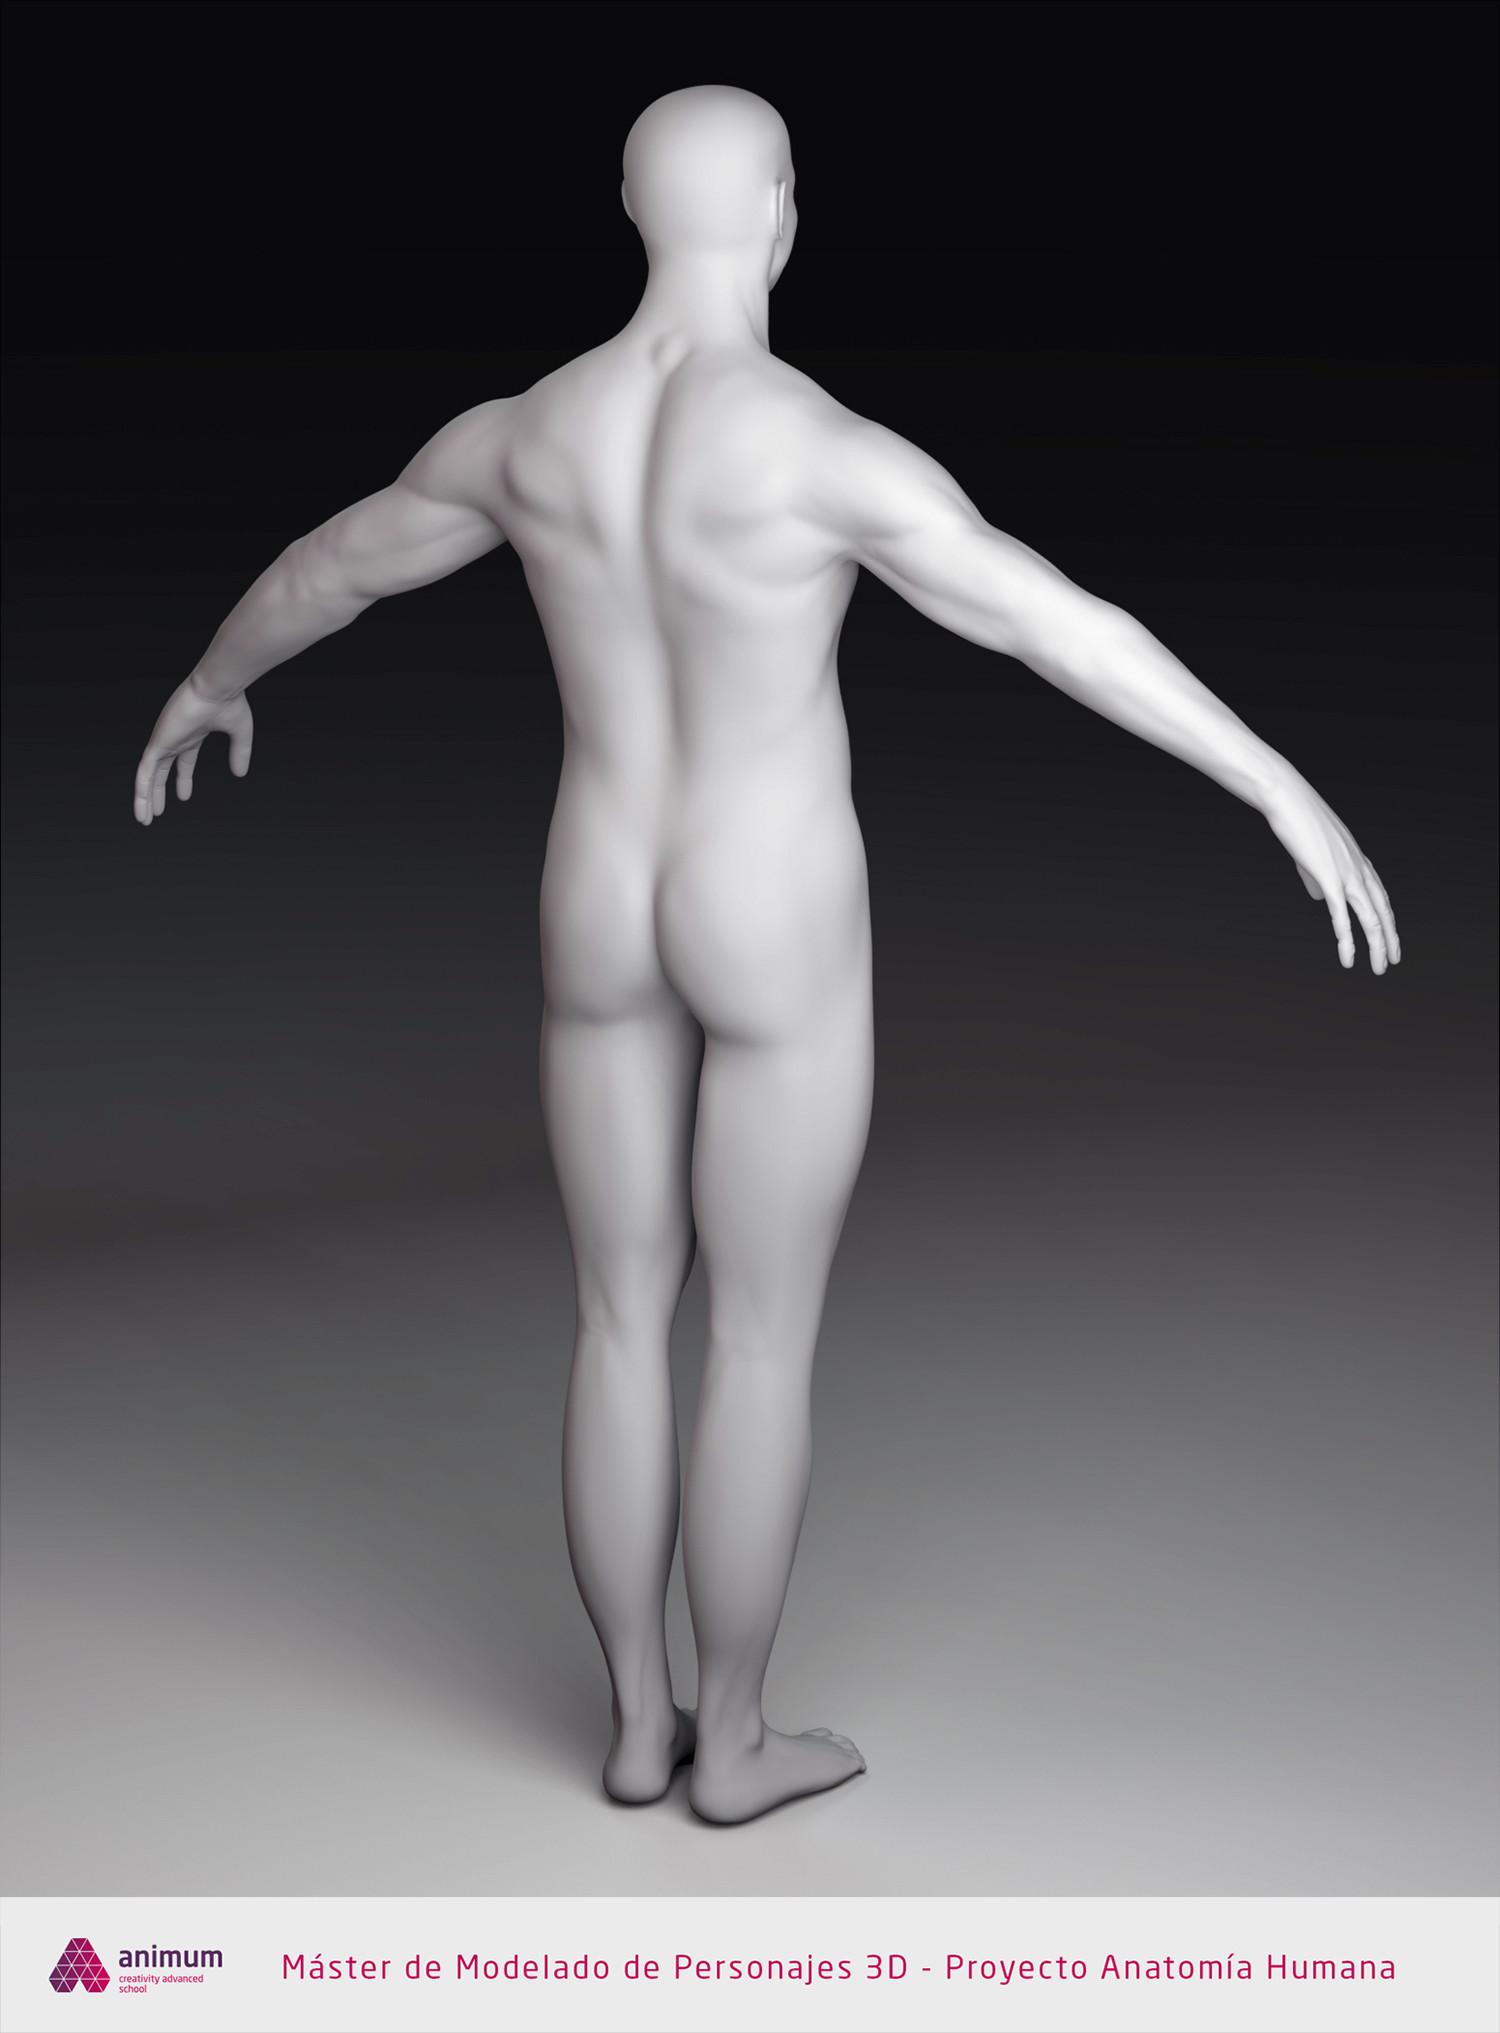 Eusebio hb humano cuerpo shaded2